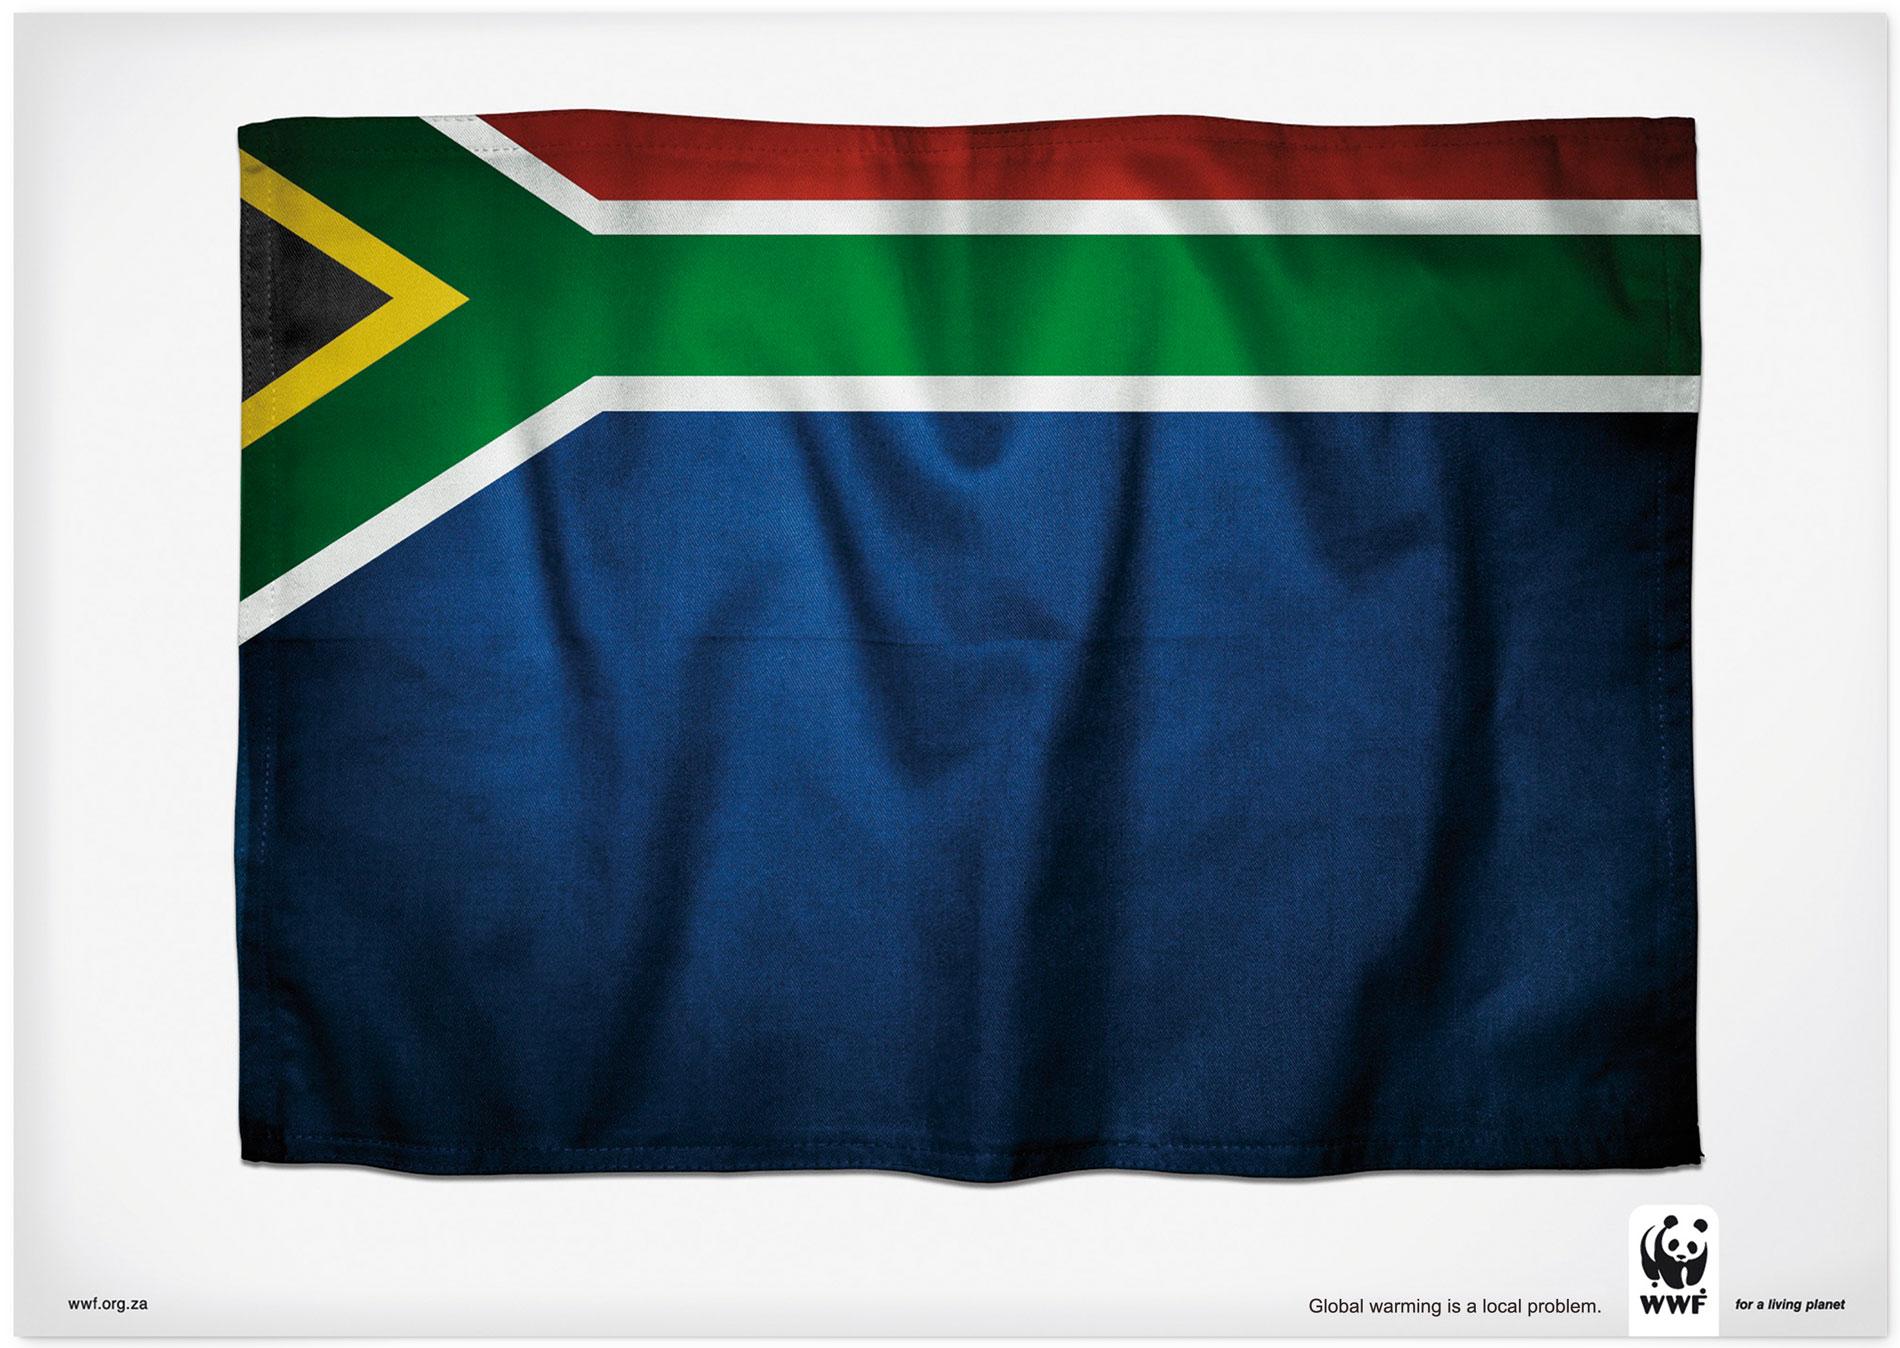 wwf-SouthAfrica.jpg